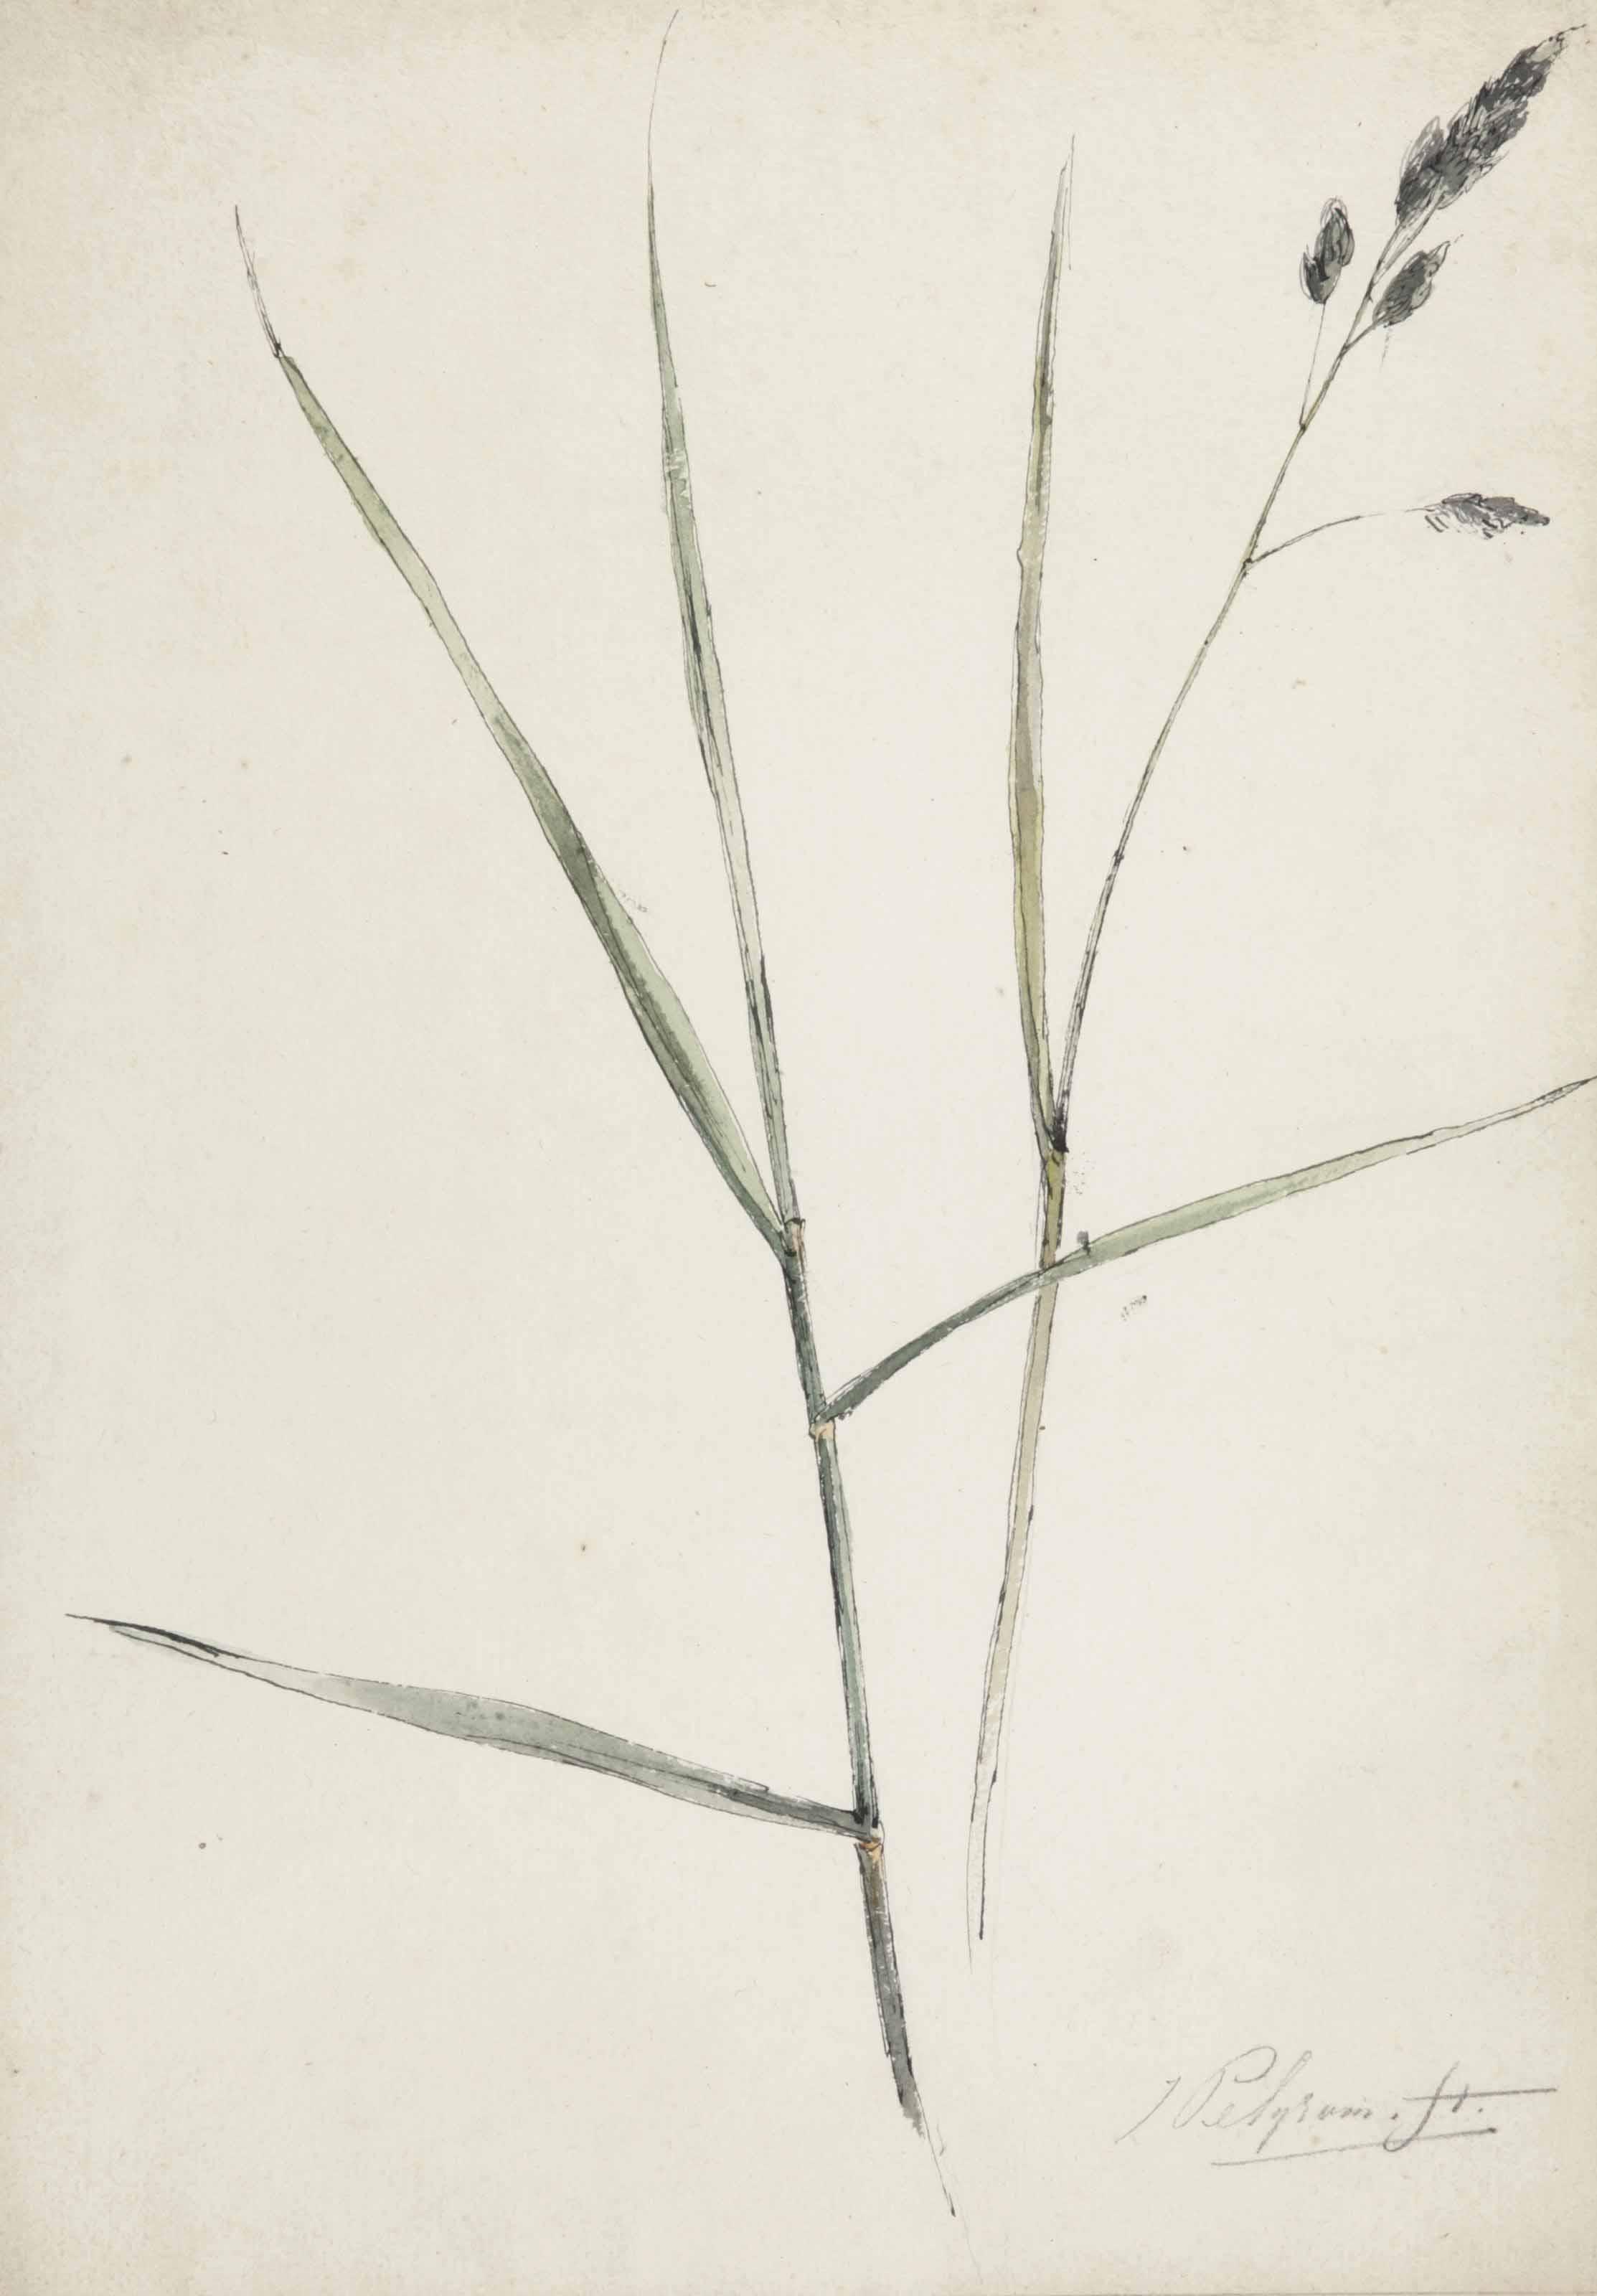 Study of grass or sedge